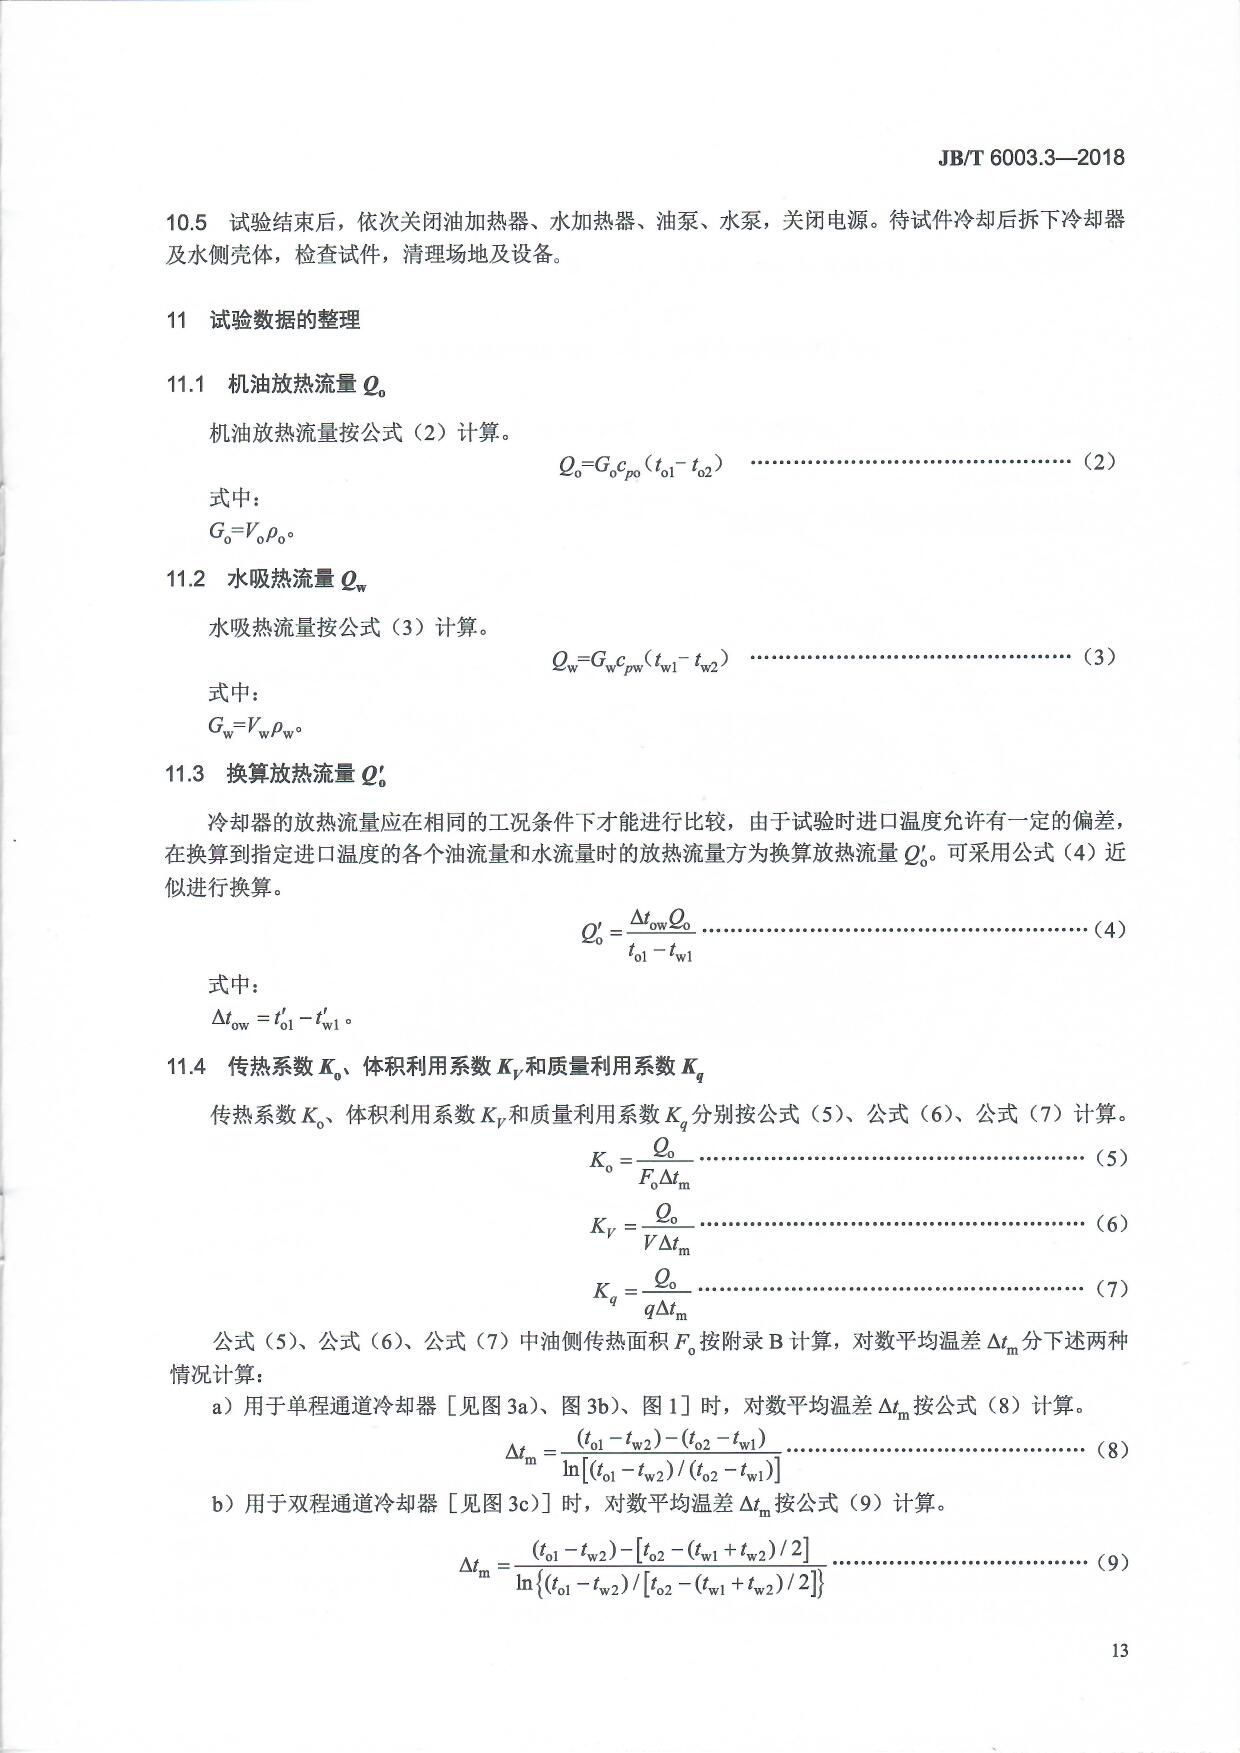 5df6db1c742ec.jpg